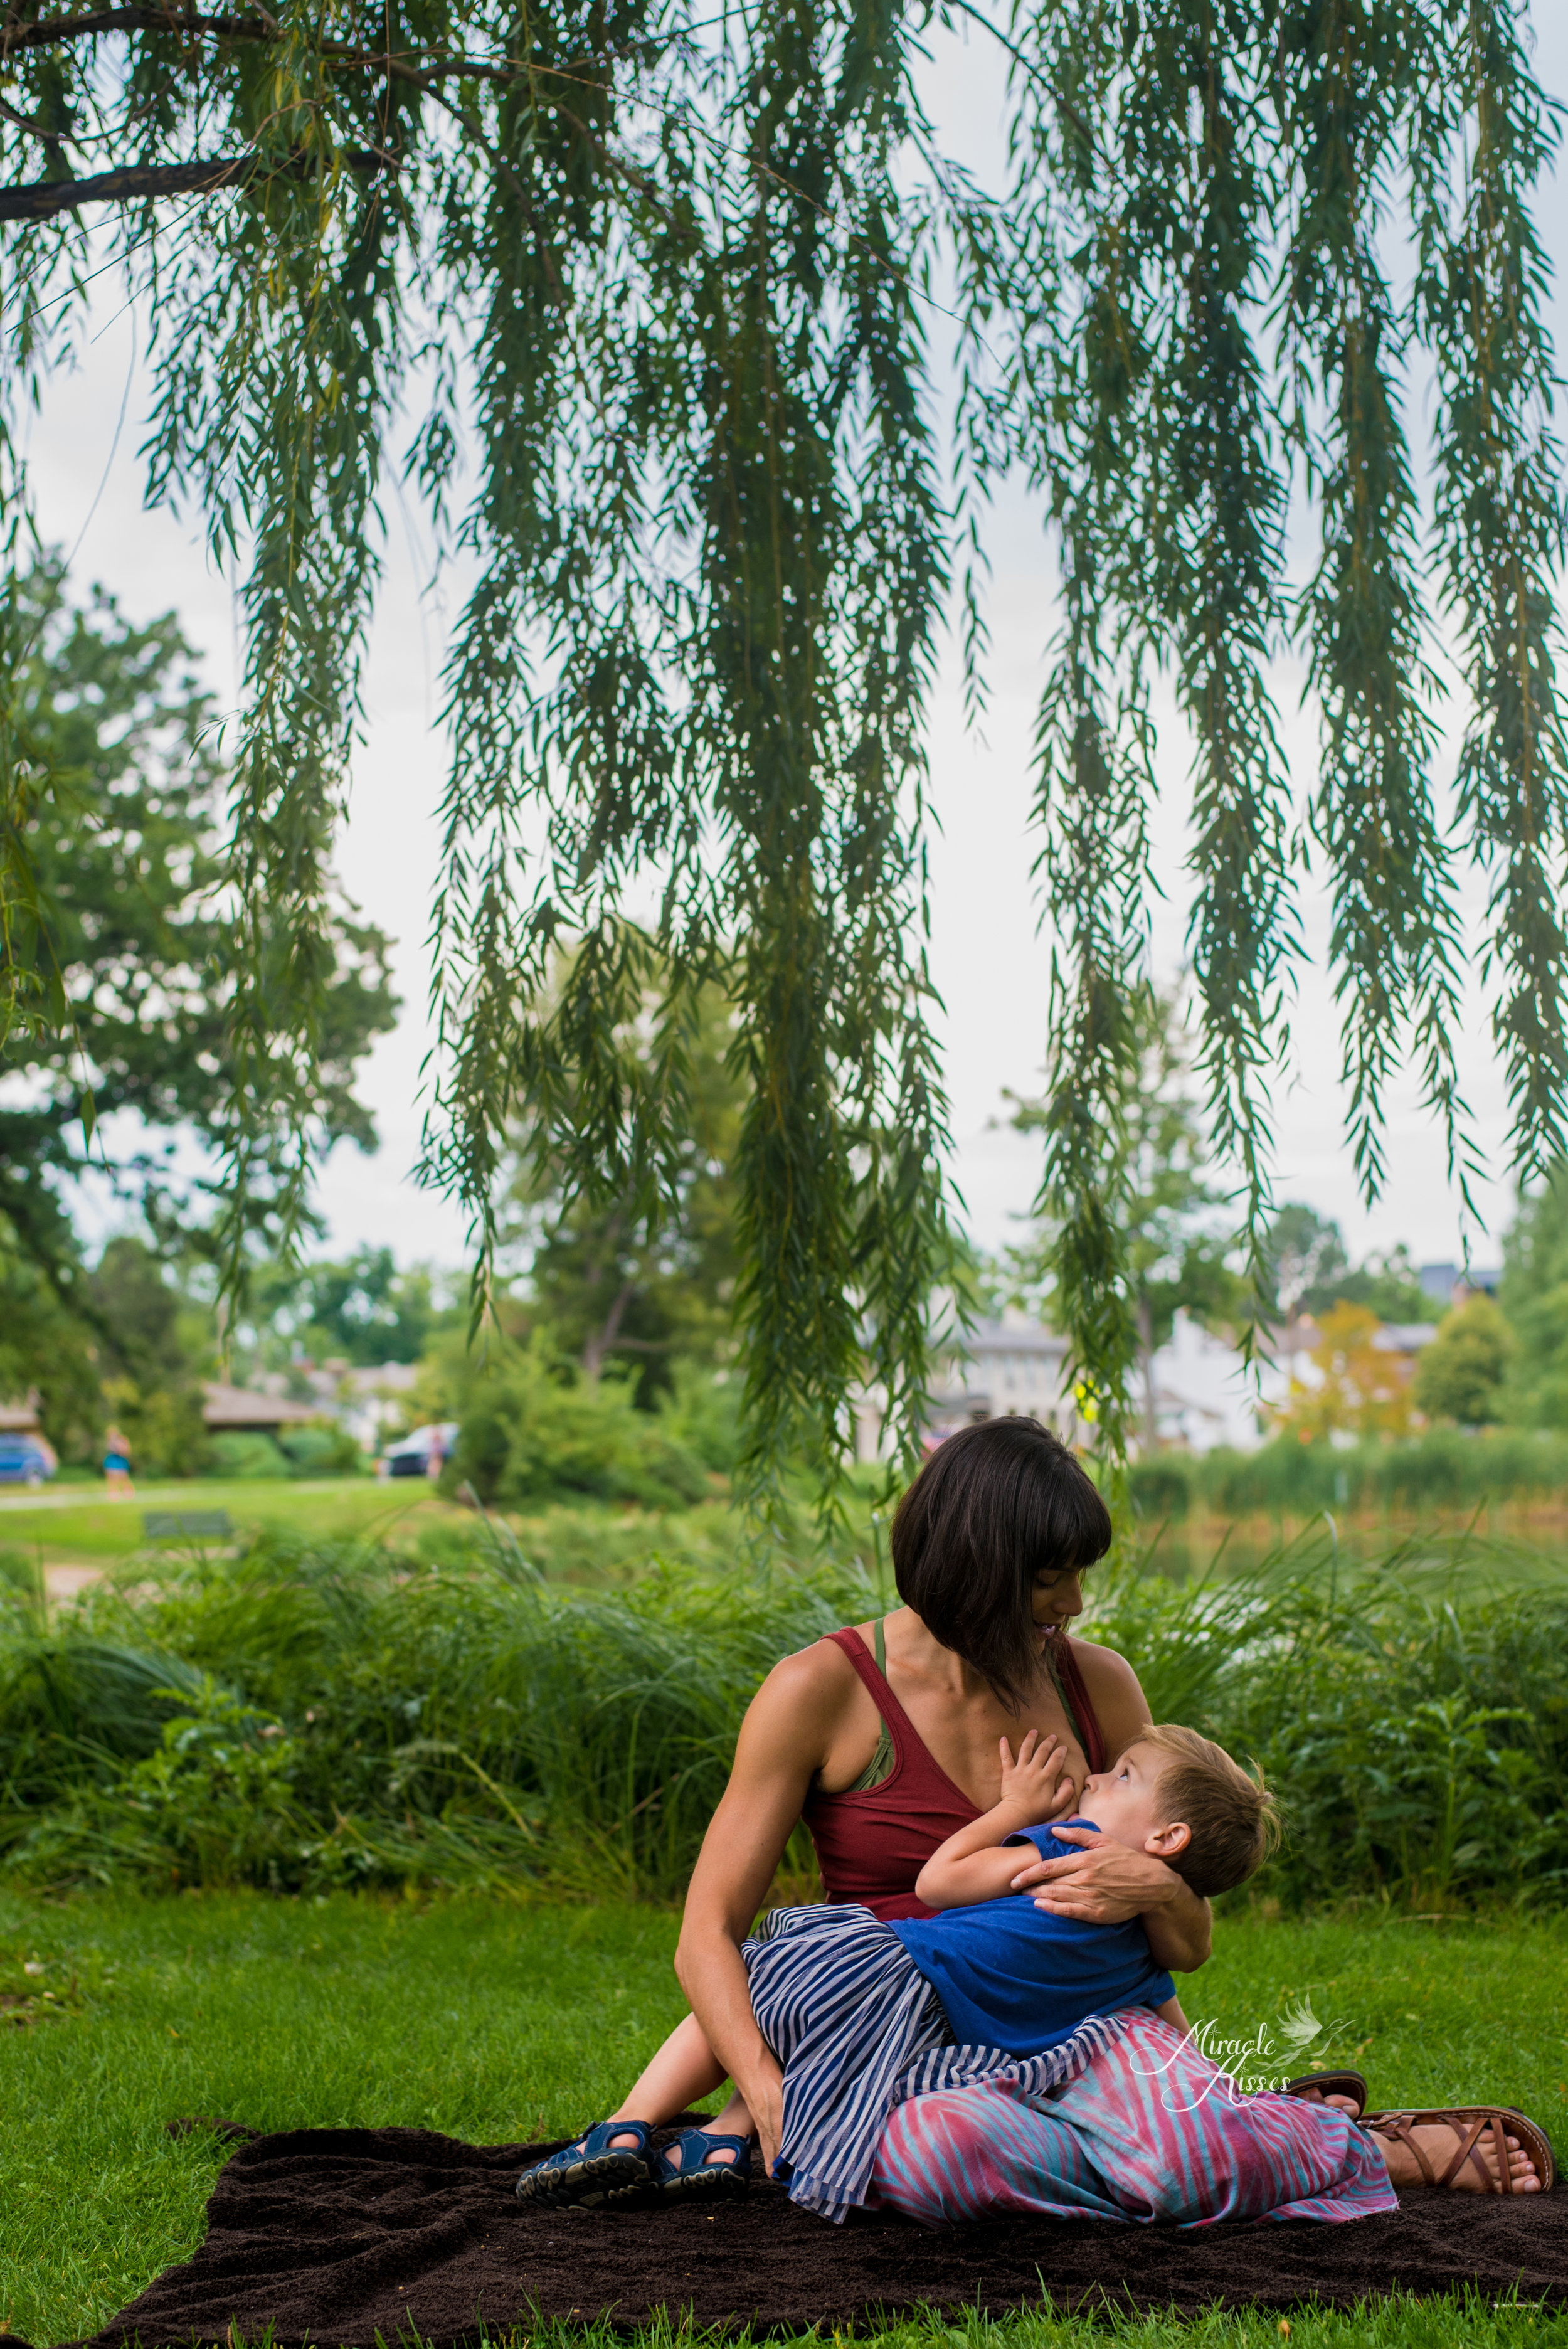 world breastfeeding week, miracle kisses, 31 days 31 stories